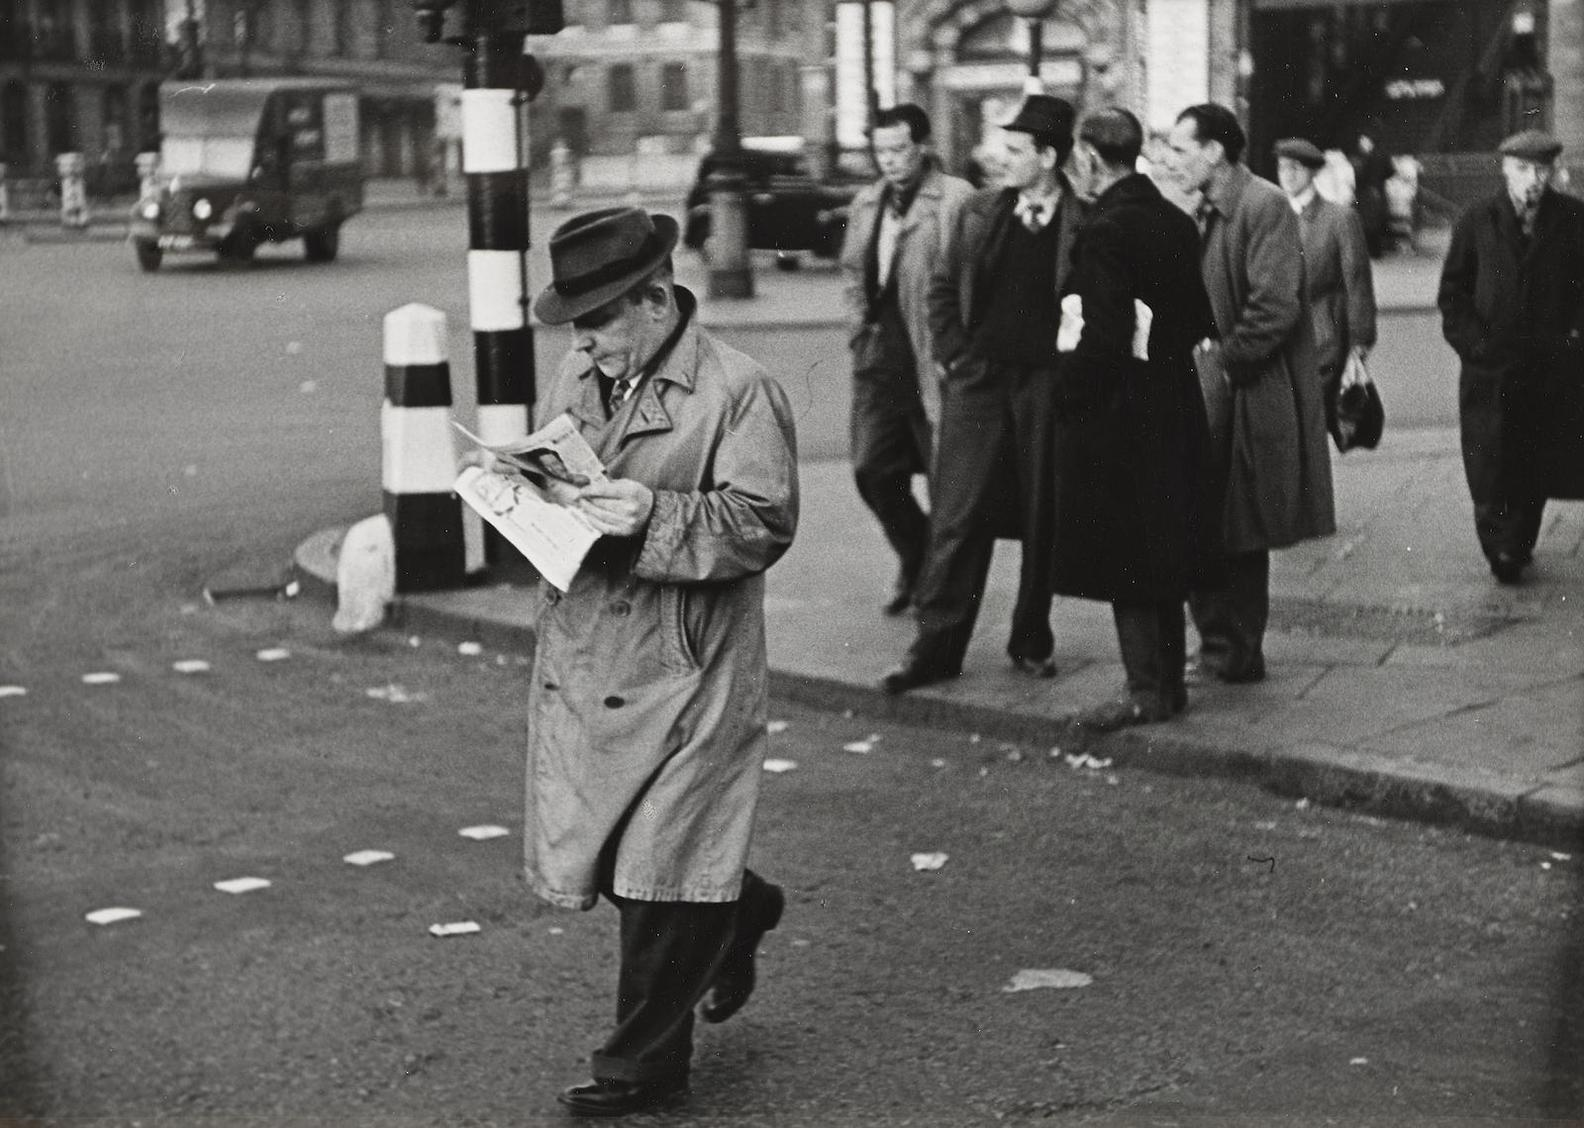 Henri Cartier-Bresson-London, Festival City; And Berlin, Europes Strangest City-1959